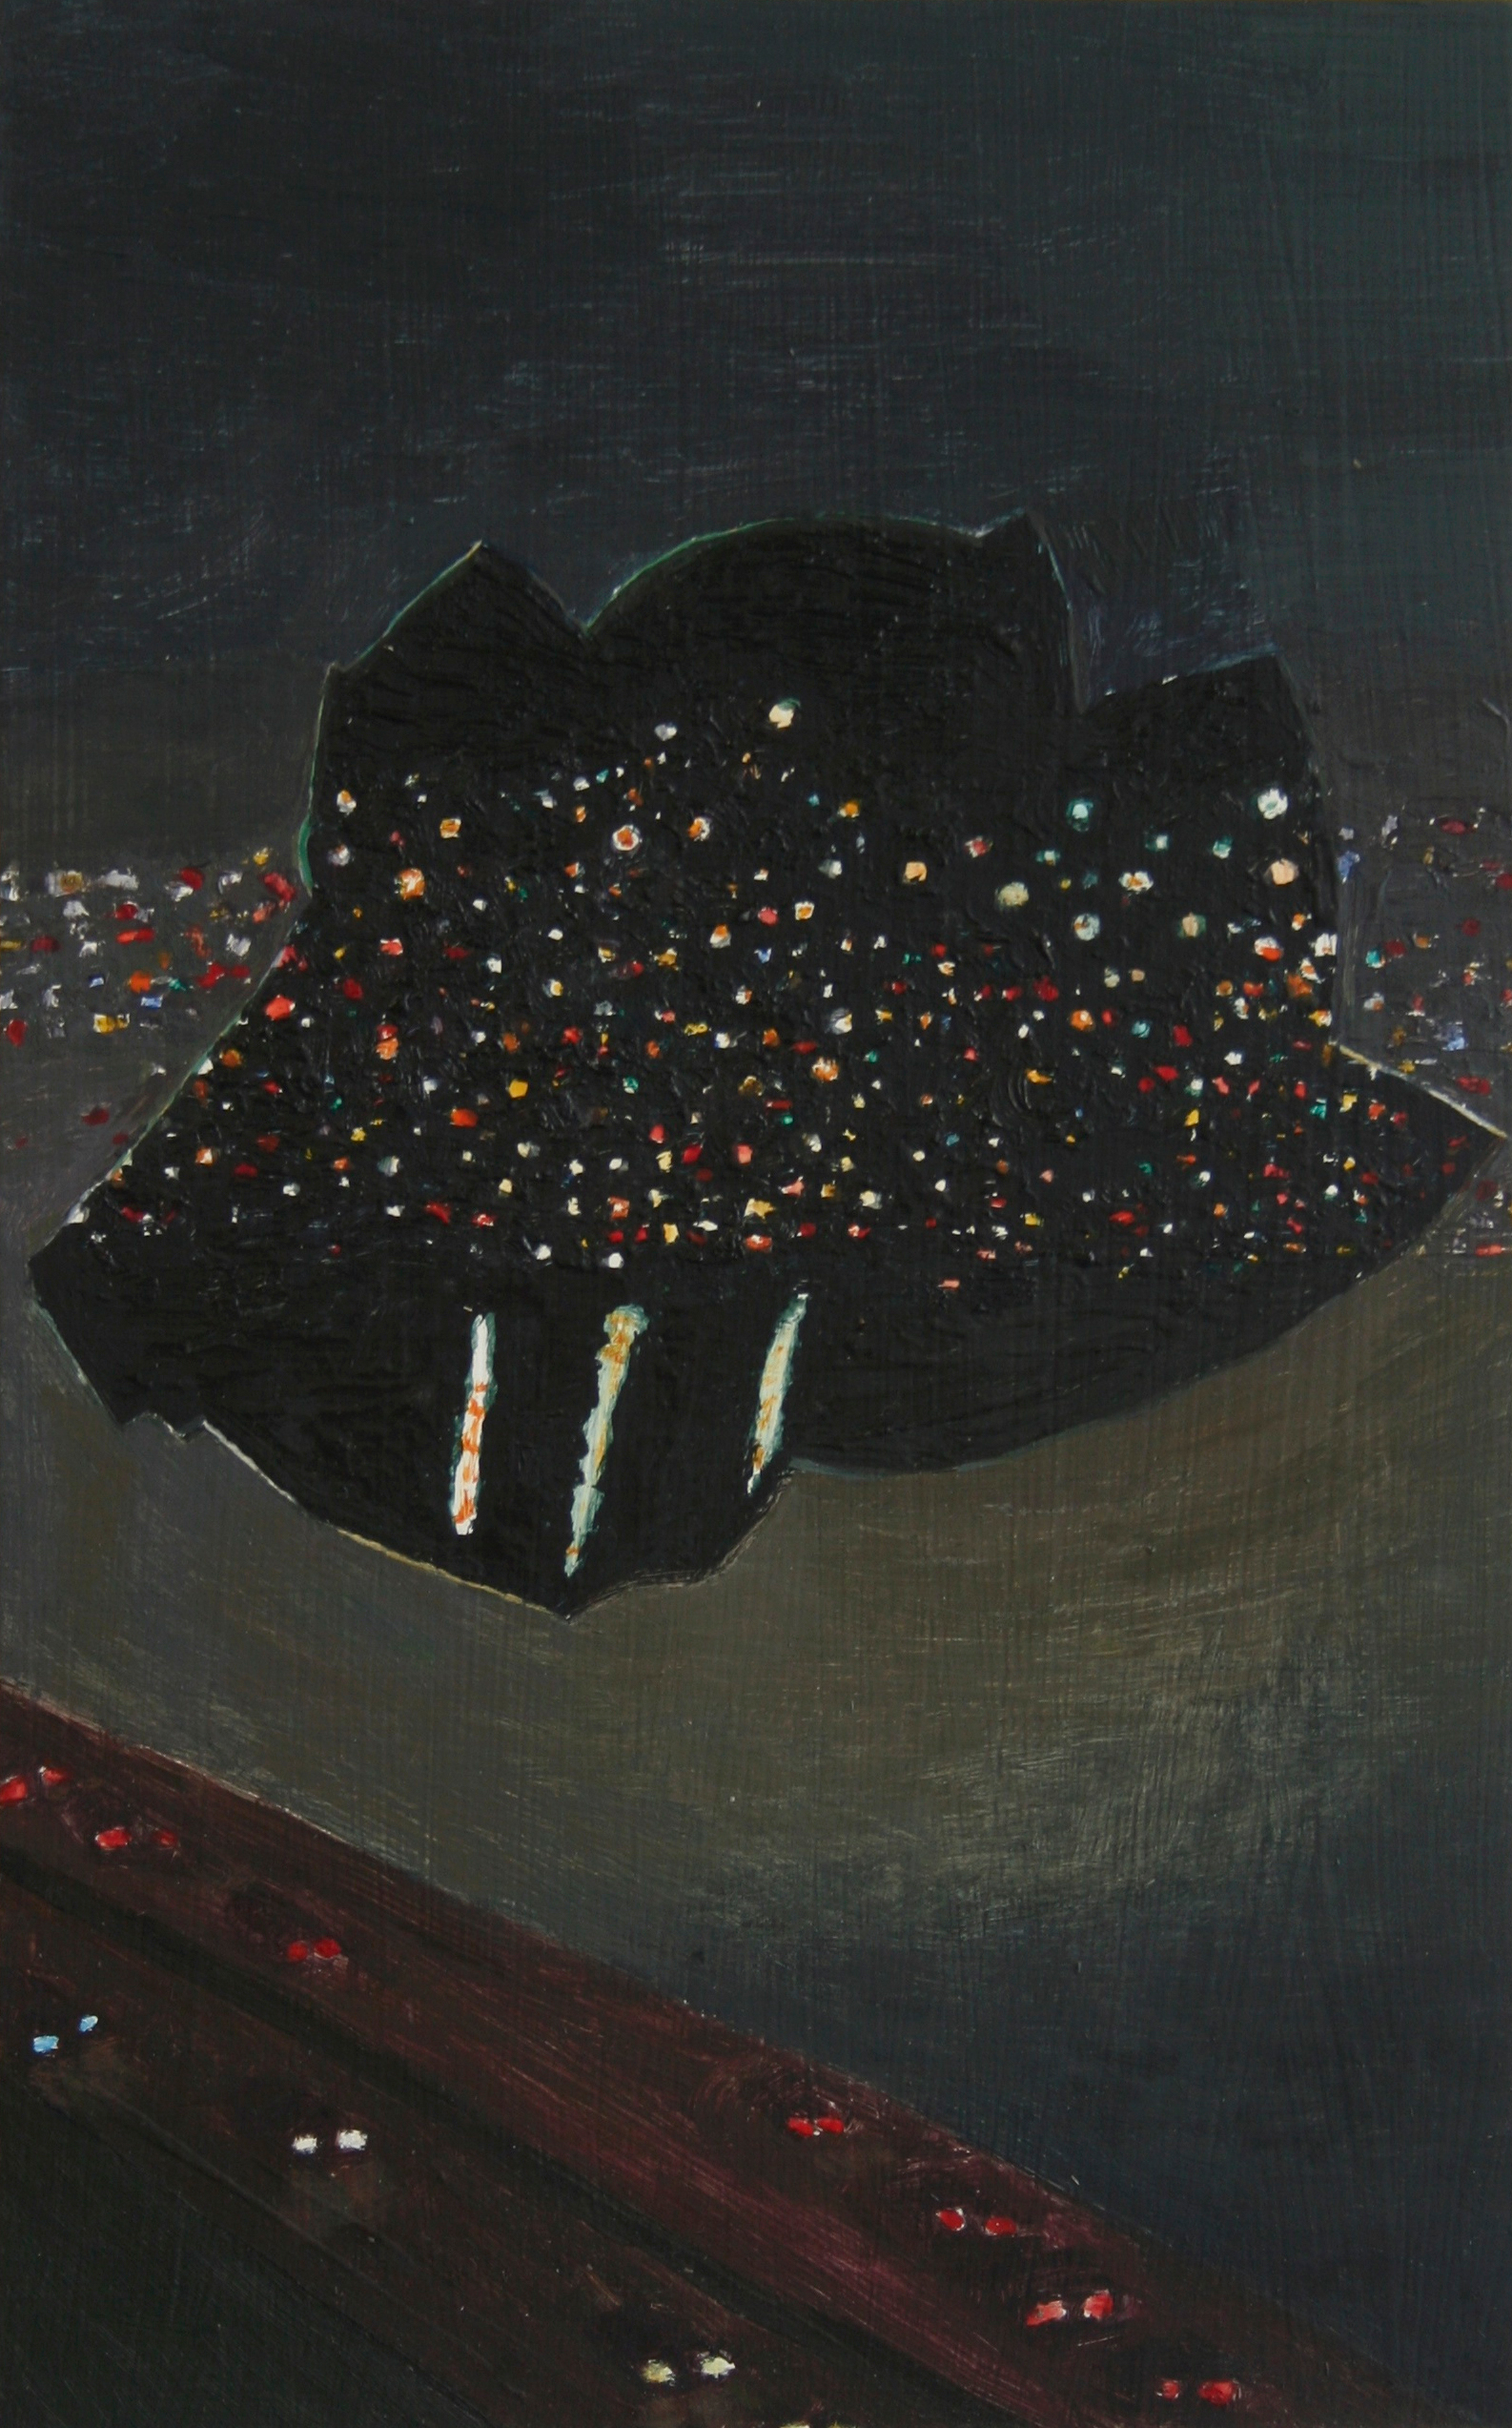 City Night Sky, Oil on panel, 15.5 x 9.5 in, 2014